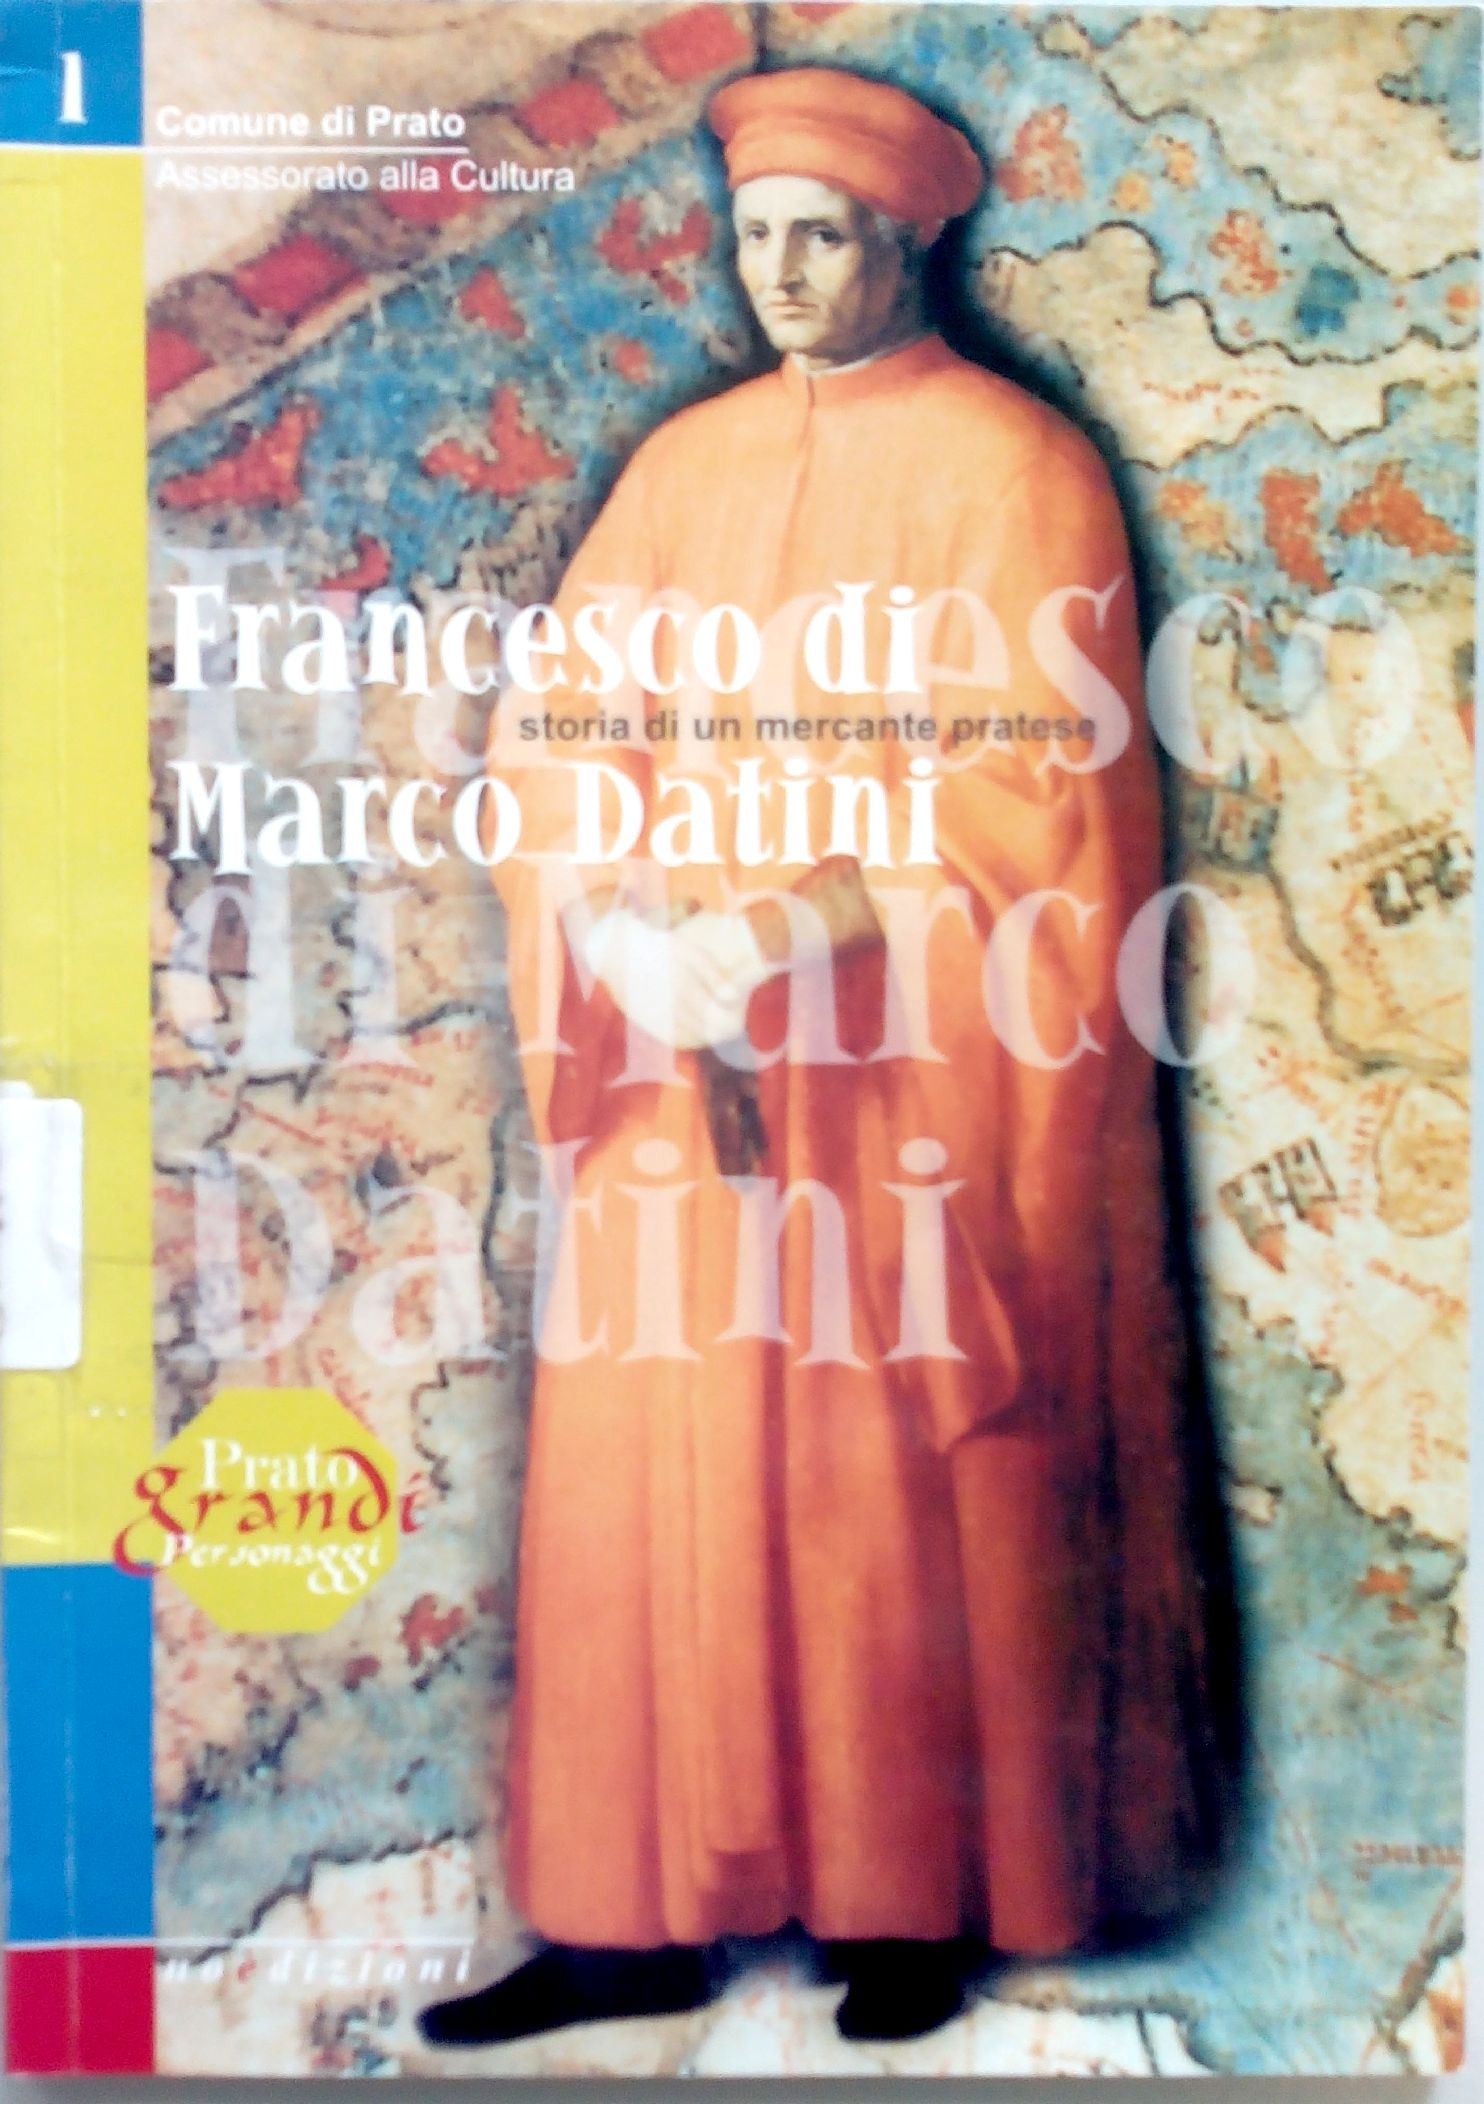 Francesco di Marco Datini